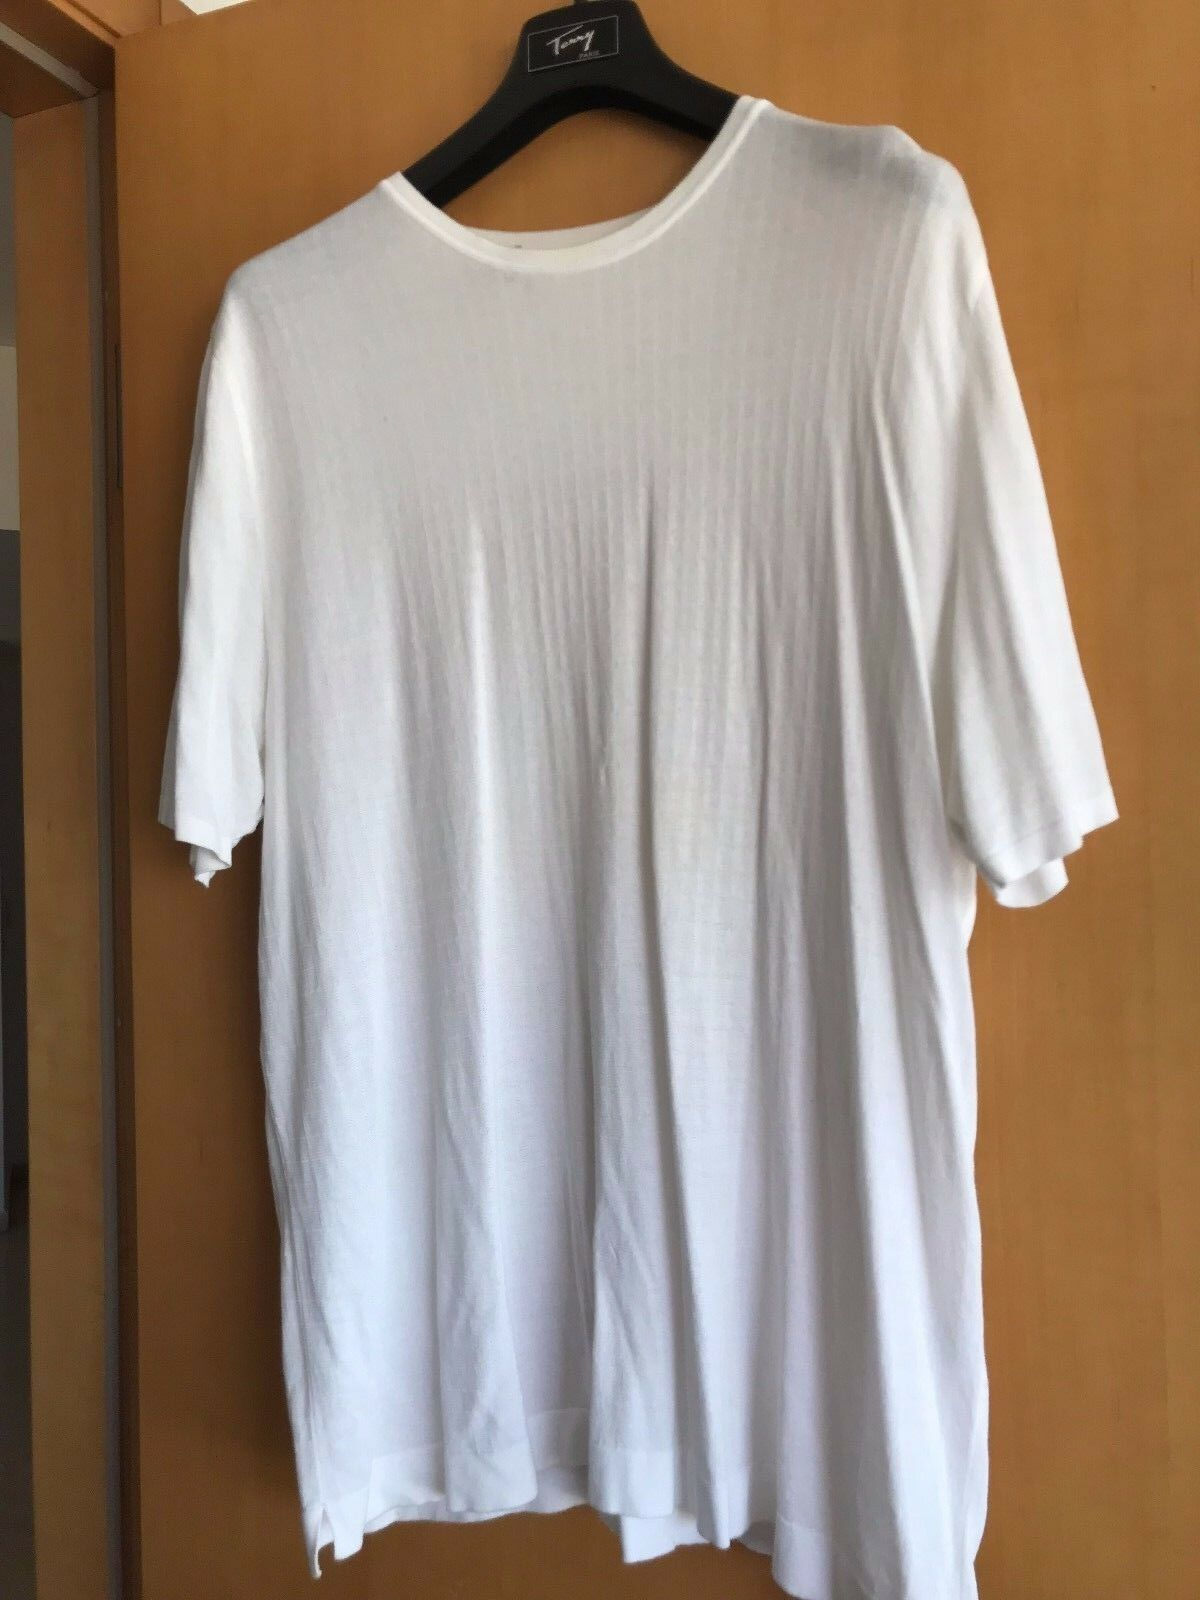 BILANCIONI Weiß short men sweater, Italian designer's sweater